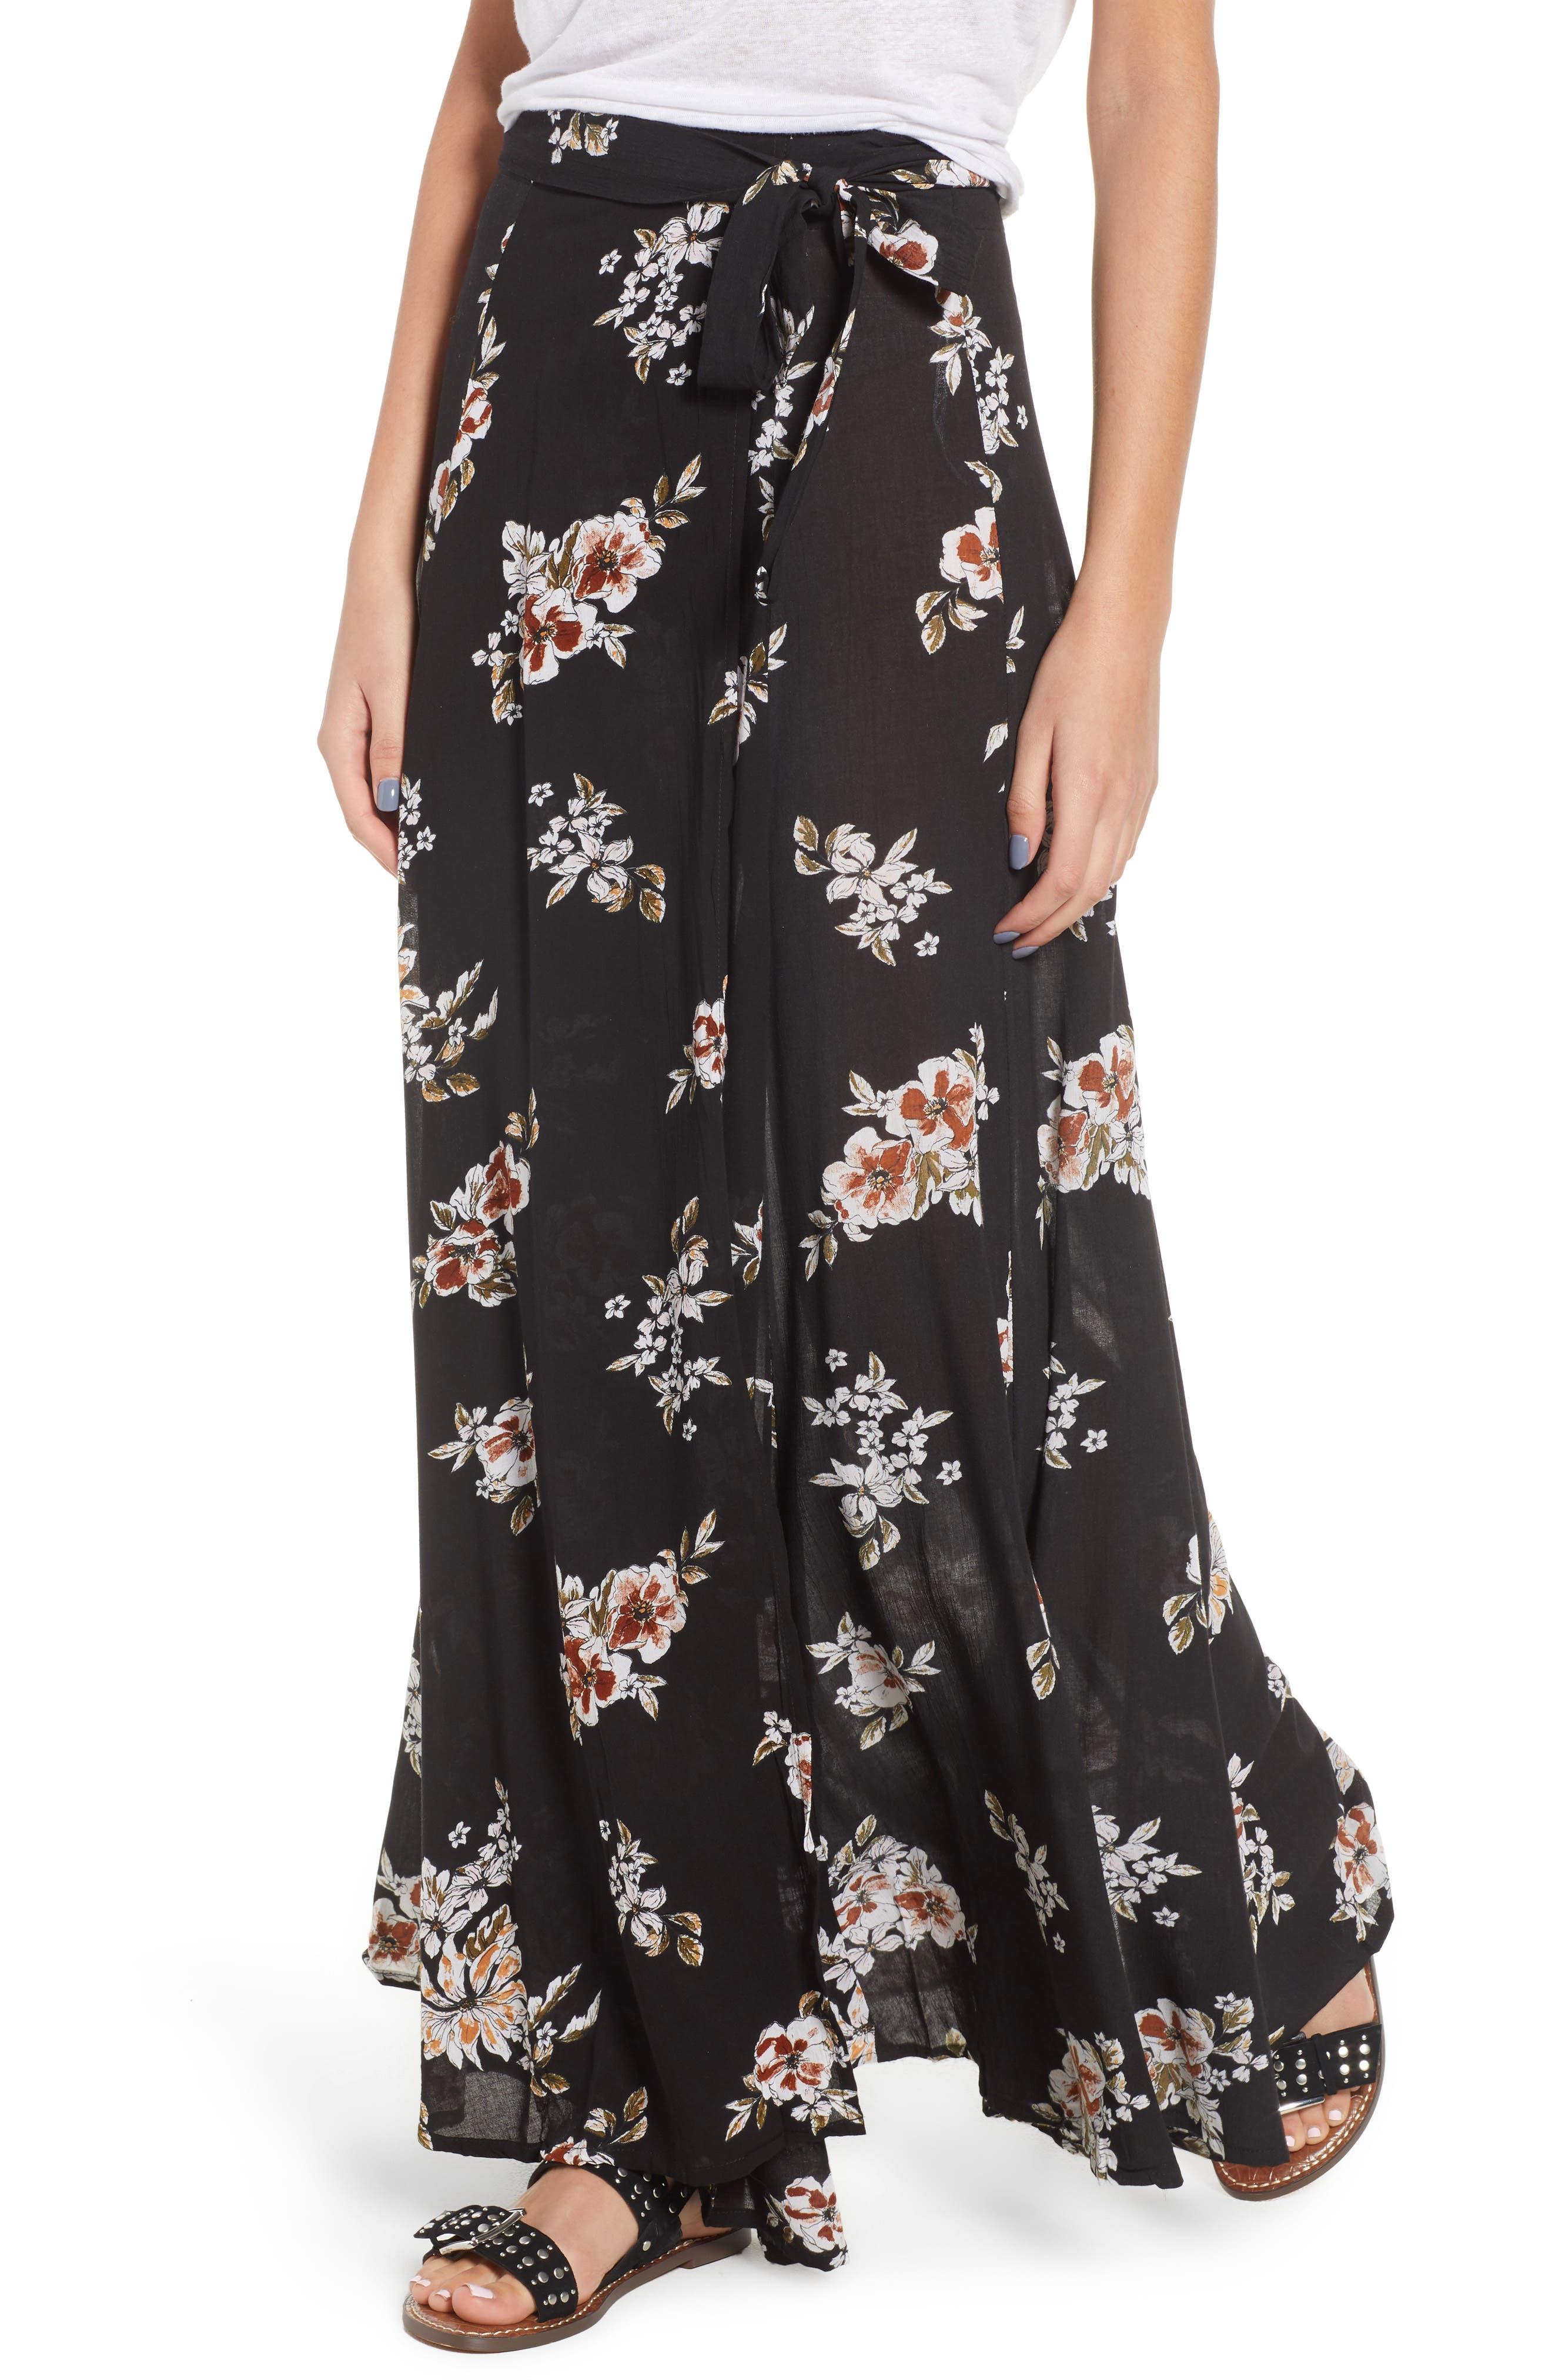 FAITHFULL THE BRAND Terviso Floral Print Maxi Skirt